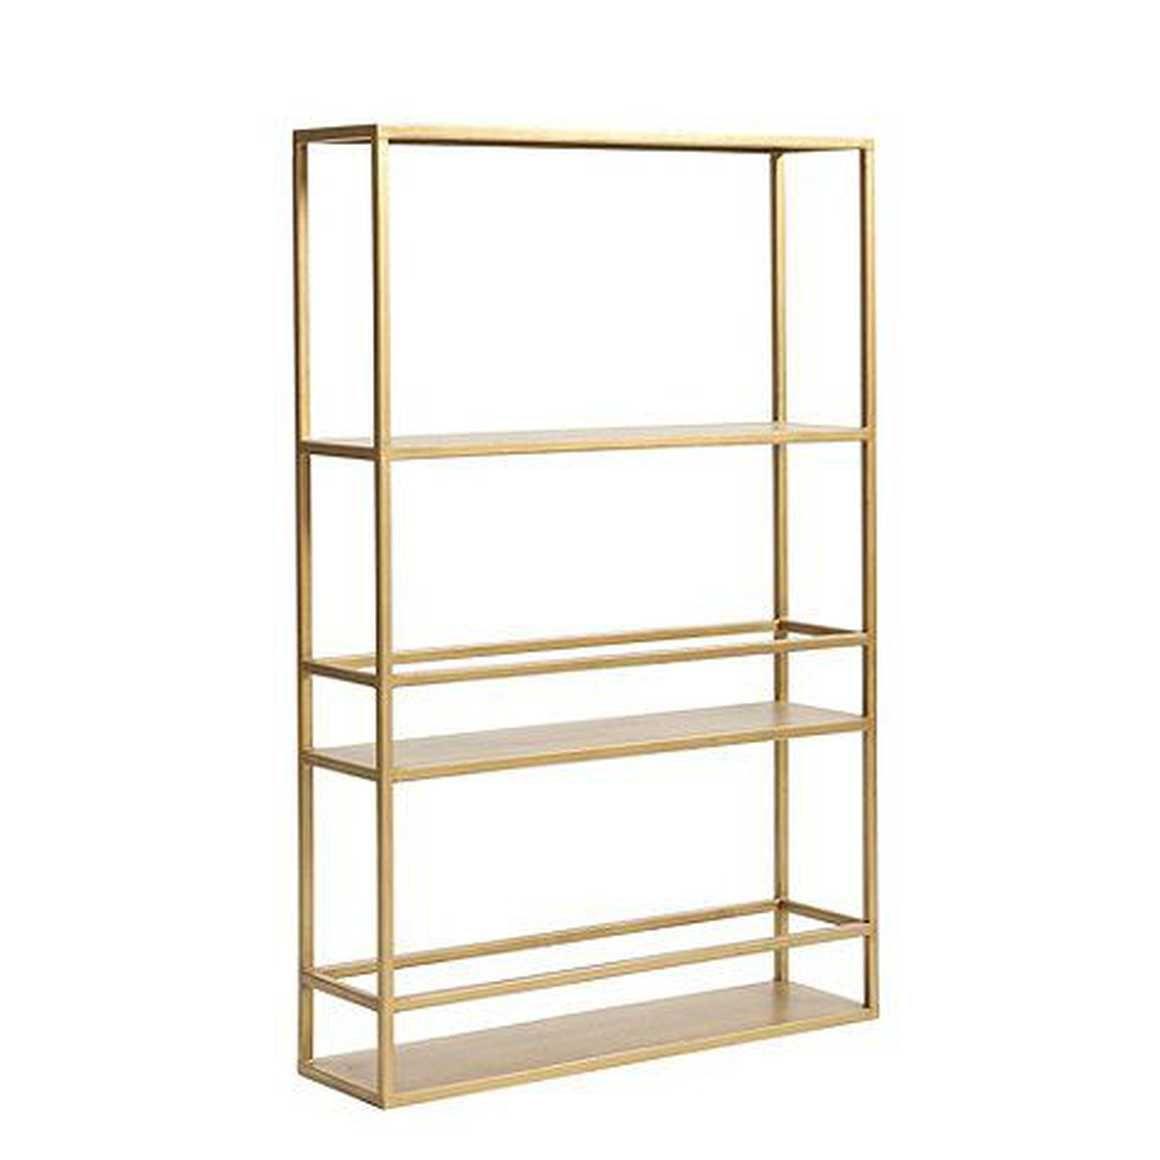 Abbott Slim Shelf Gold By Ballard Designs Shelves Bar Furniture Bathroom Wall Shelves